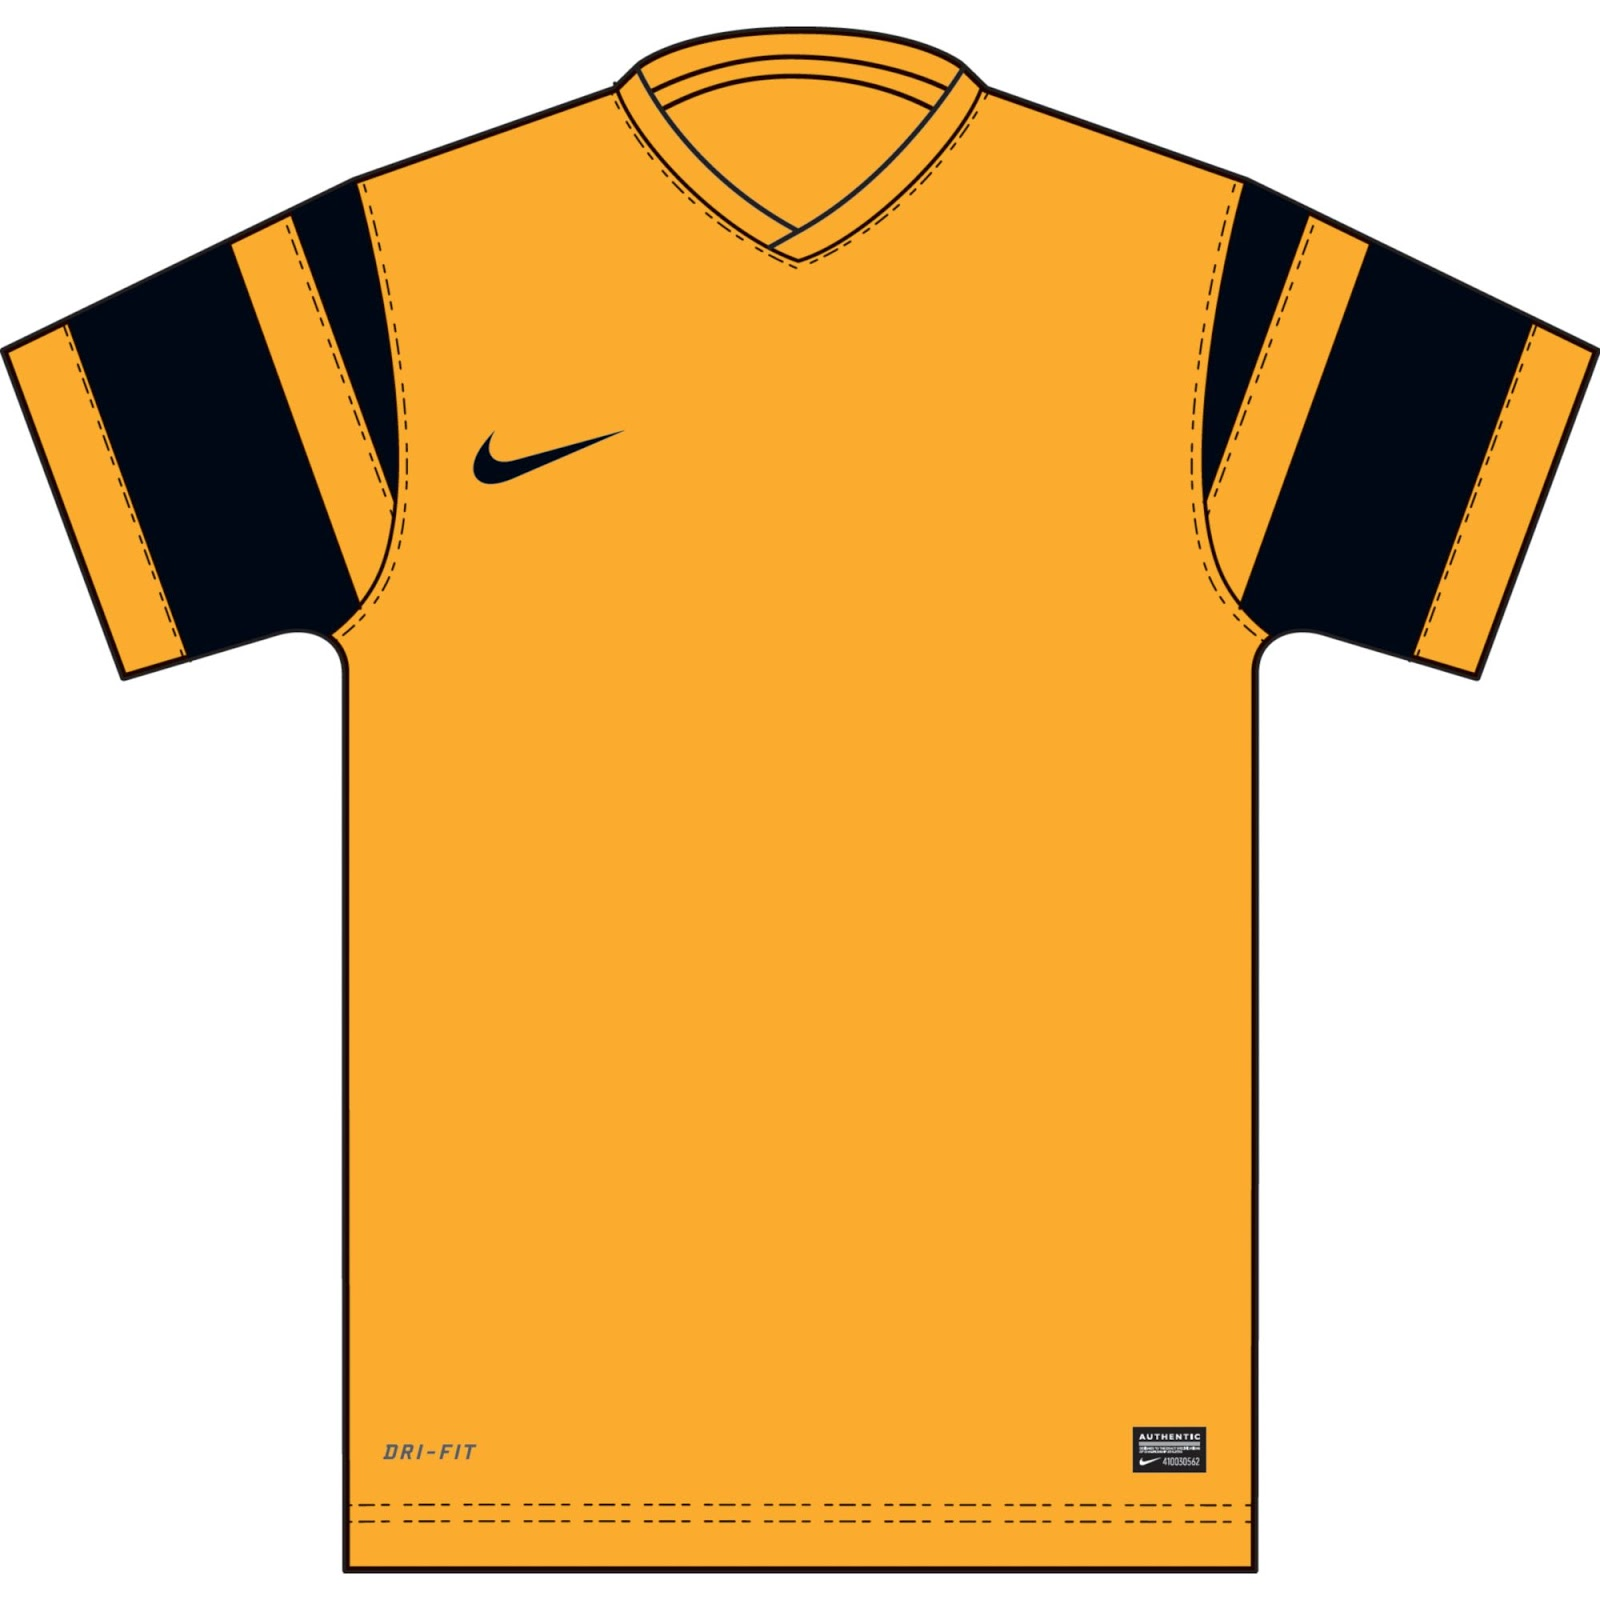 Nike 2014-2015 Templates